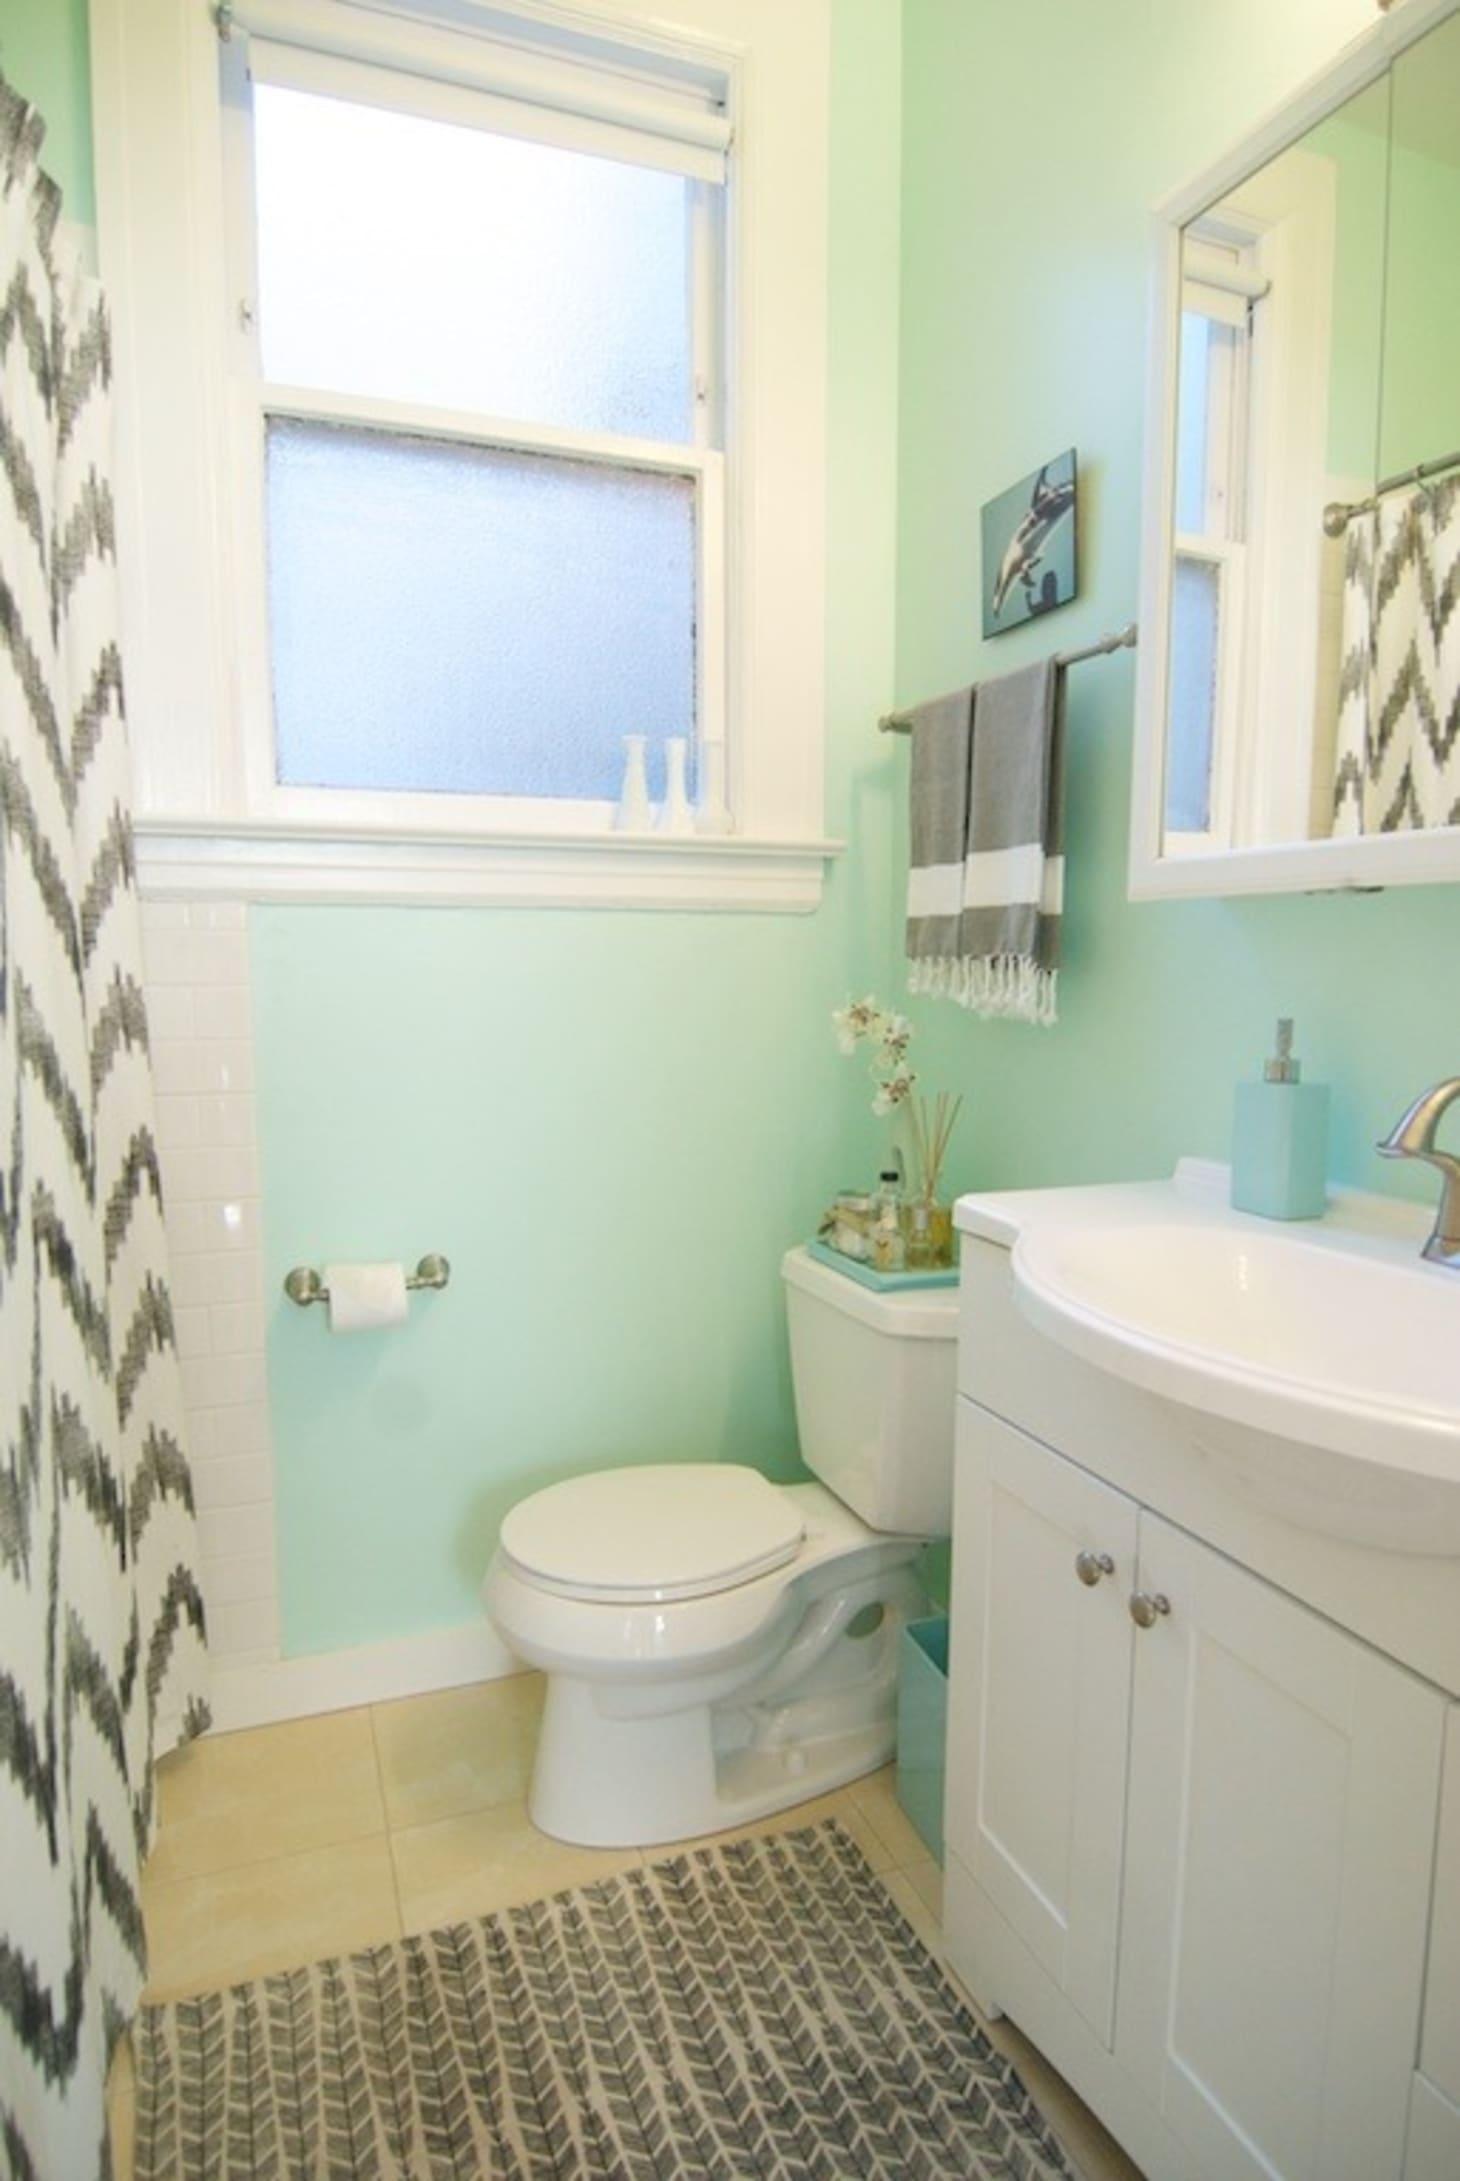 20 Reversible Ideas to Overhaul Your Rental Bathroom NOW ... on Apartment Bathroom Ideas  id=19213